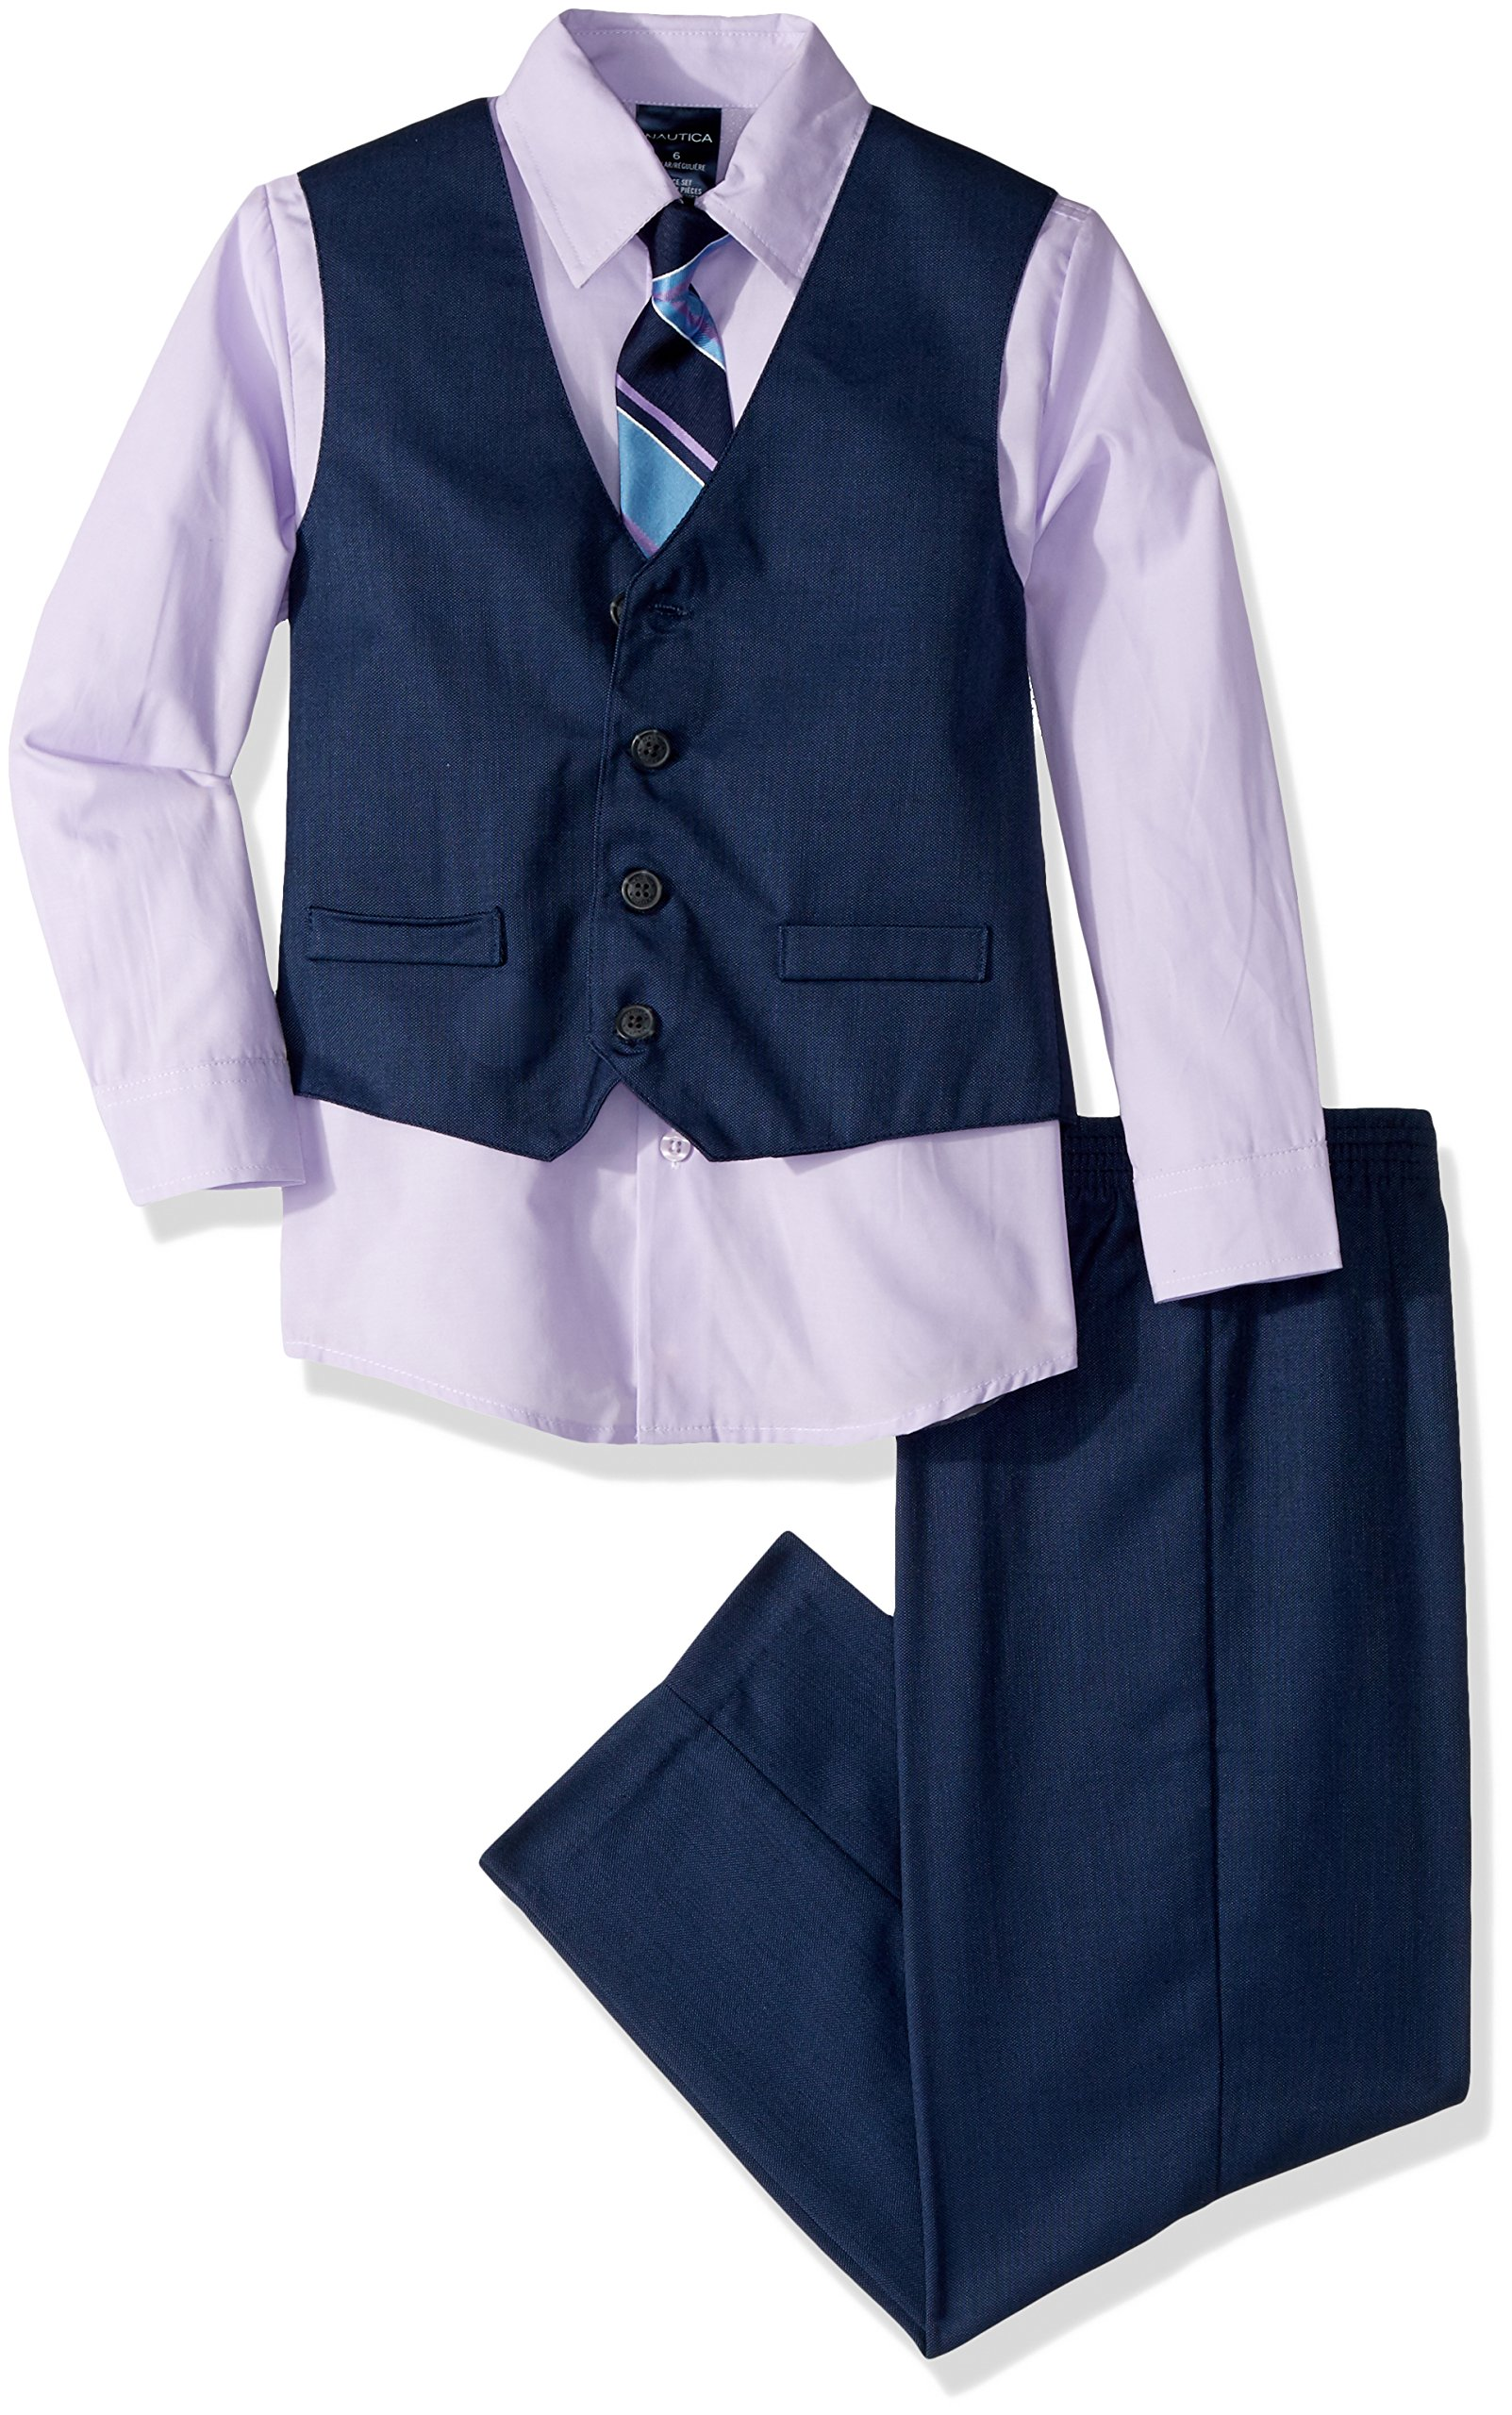 Nautica Dressy Vest Set, Dark Blue/Violet, 4T/4